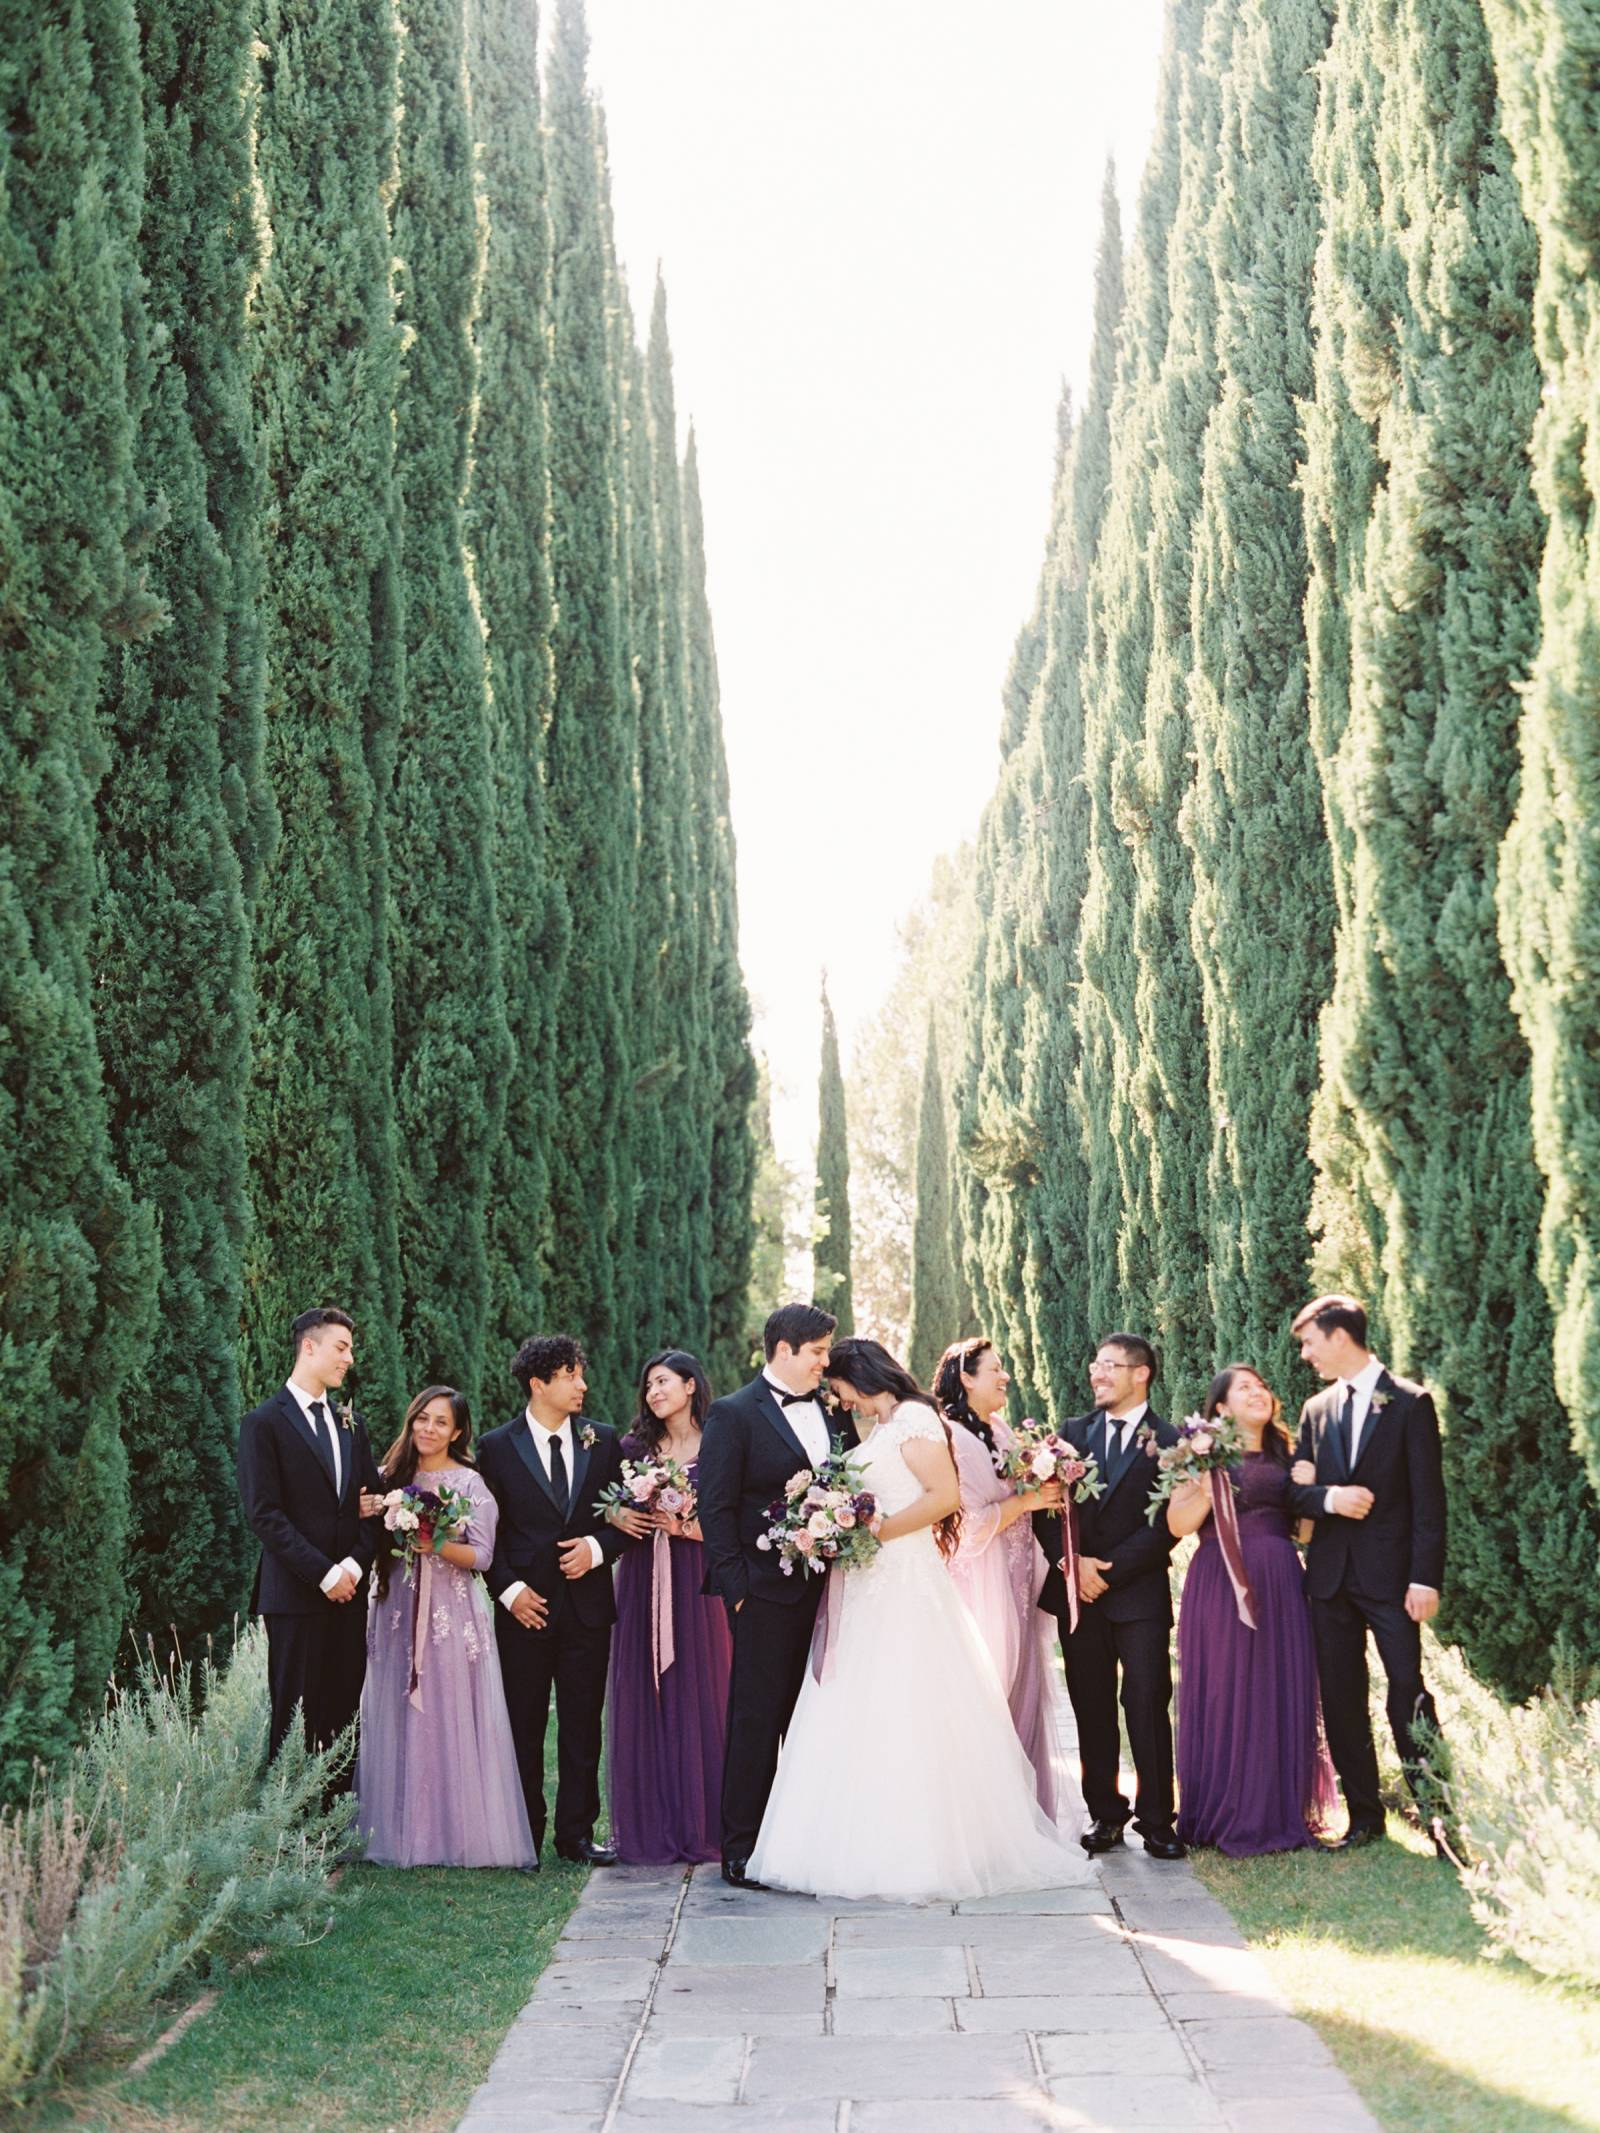 Greystone Mansion Wedding In Rich Plum Berry Tones Beverly Hills Real Weddings Gallery Item 15